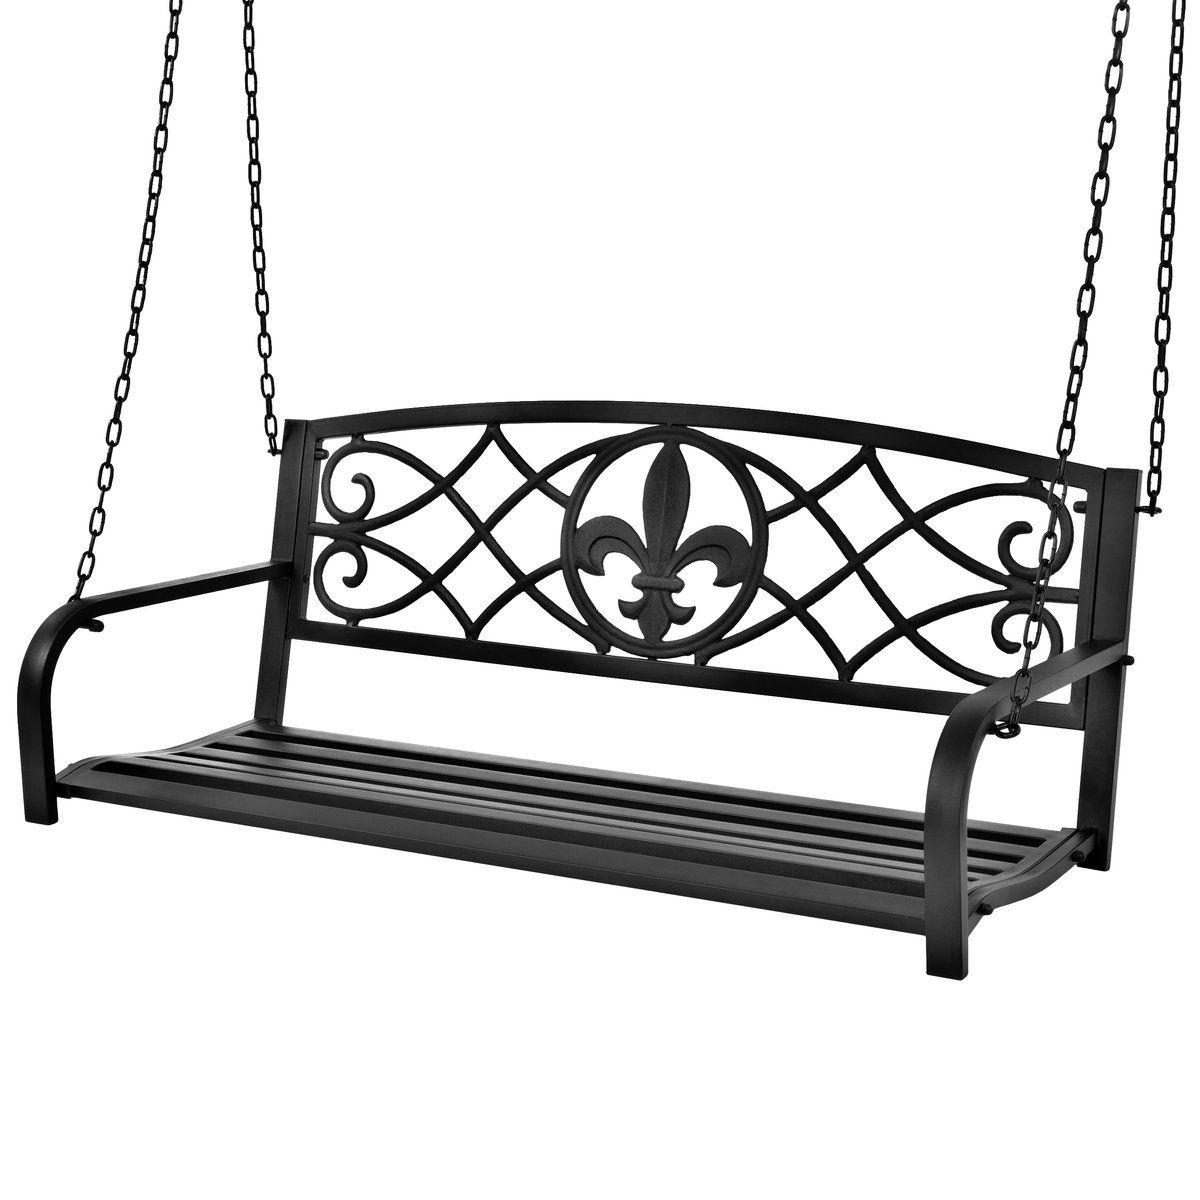 2019 2 Person Black Steel Outdoor Swings Within Outdoor Metal Hanging 2 Person Swing Bench W/ Fleur De Lis (View 9 of 30)